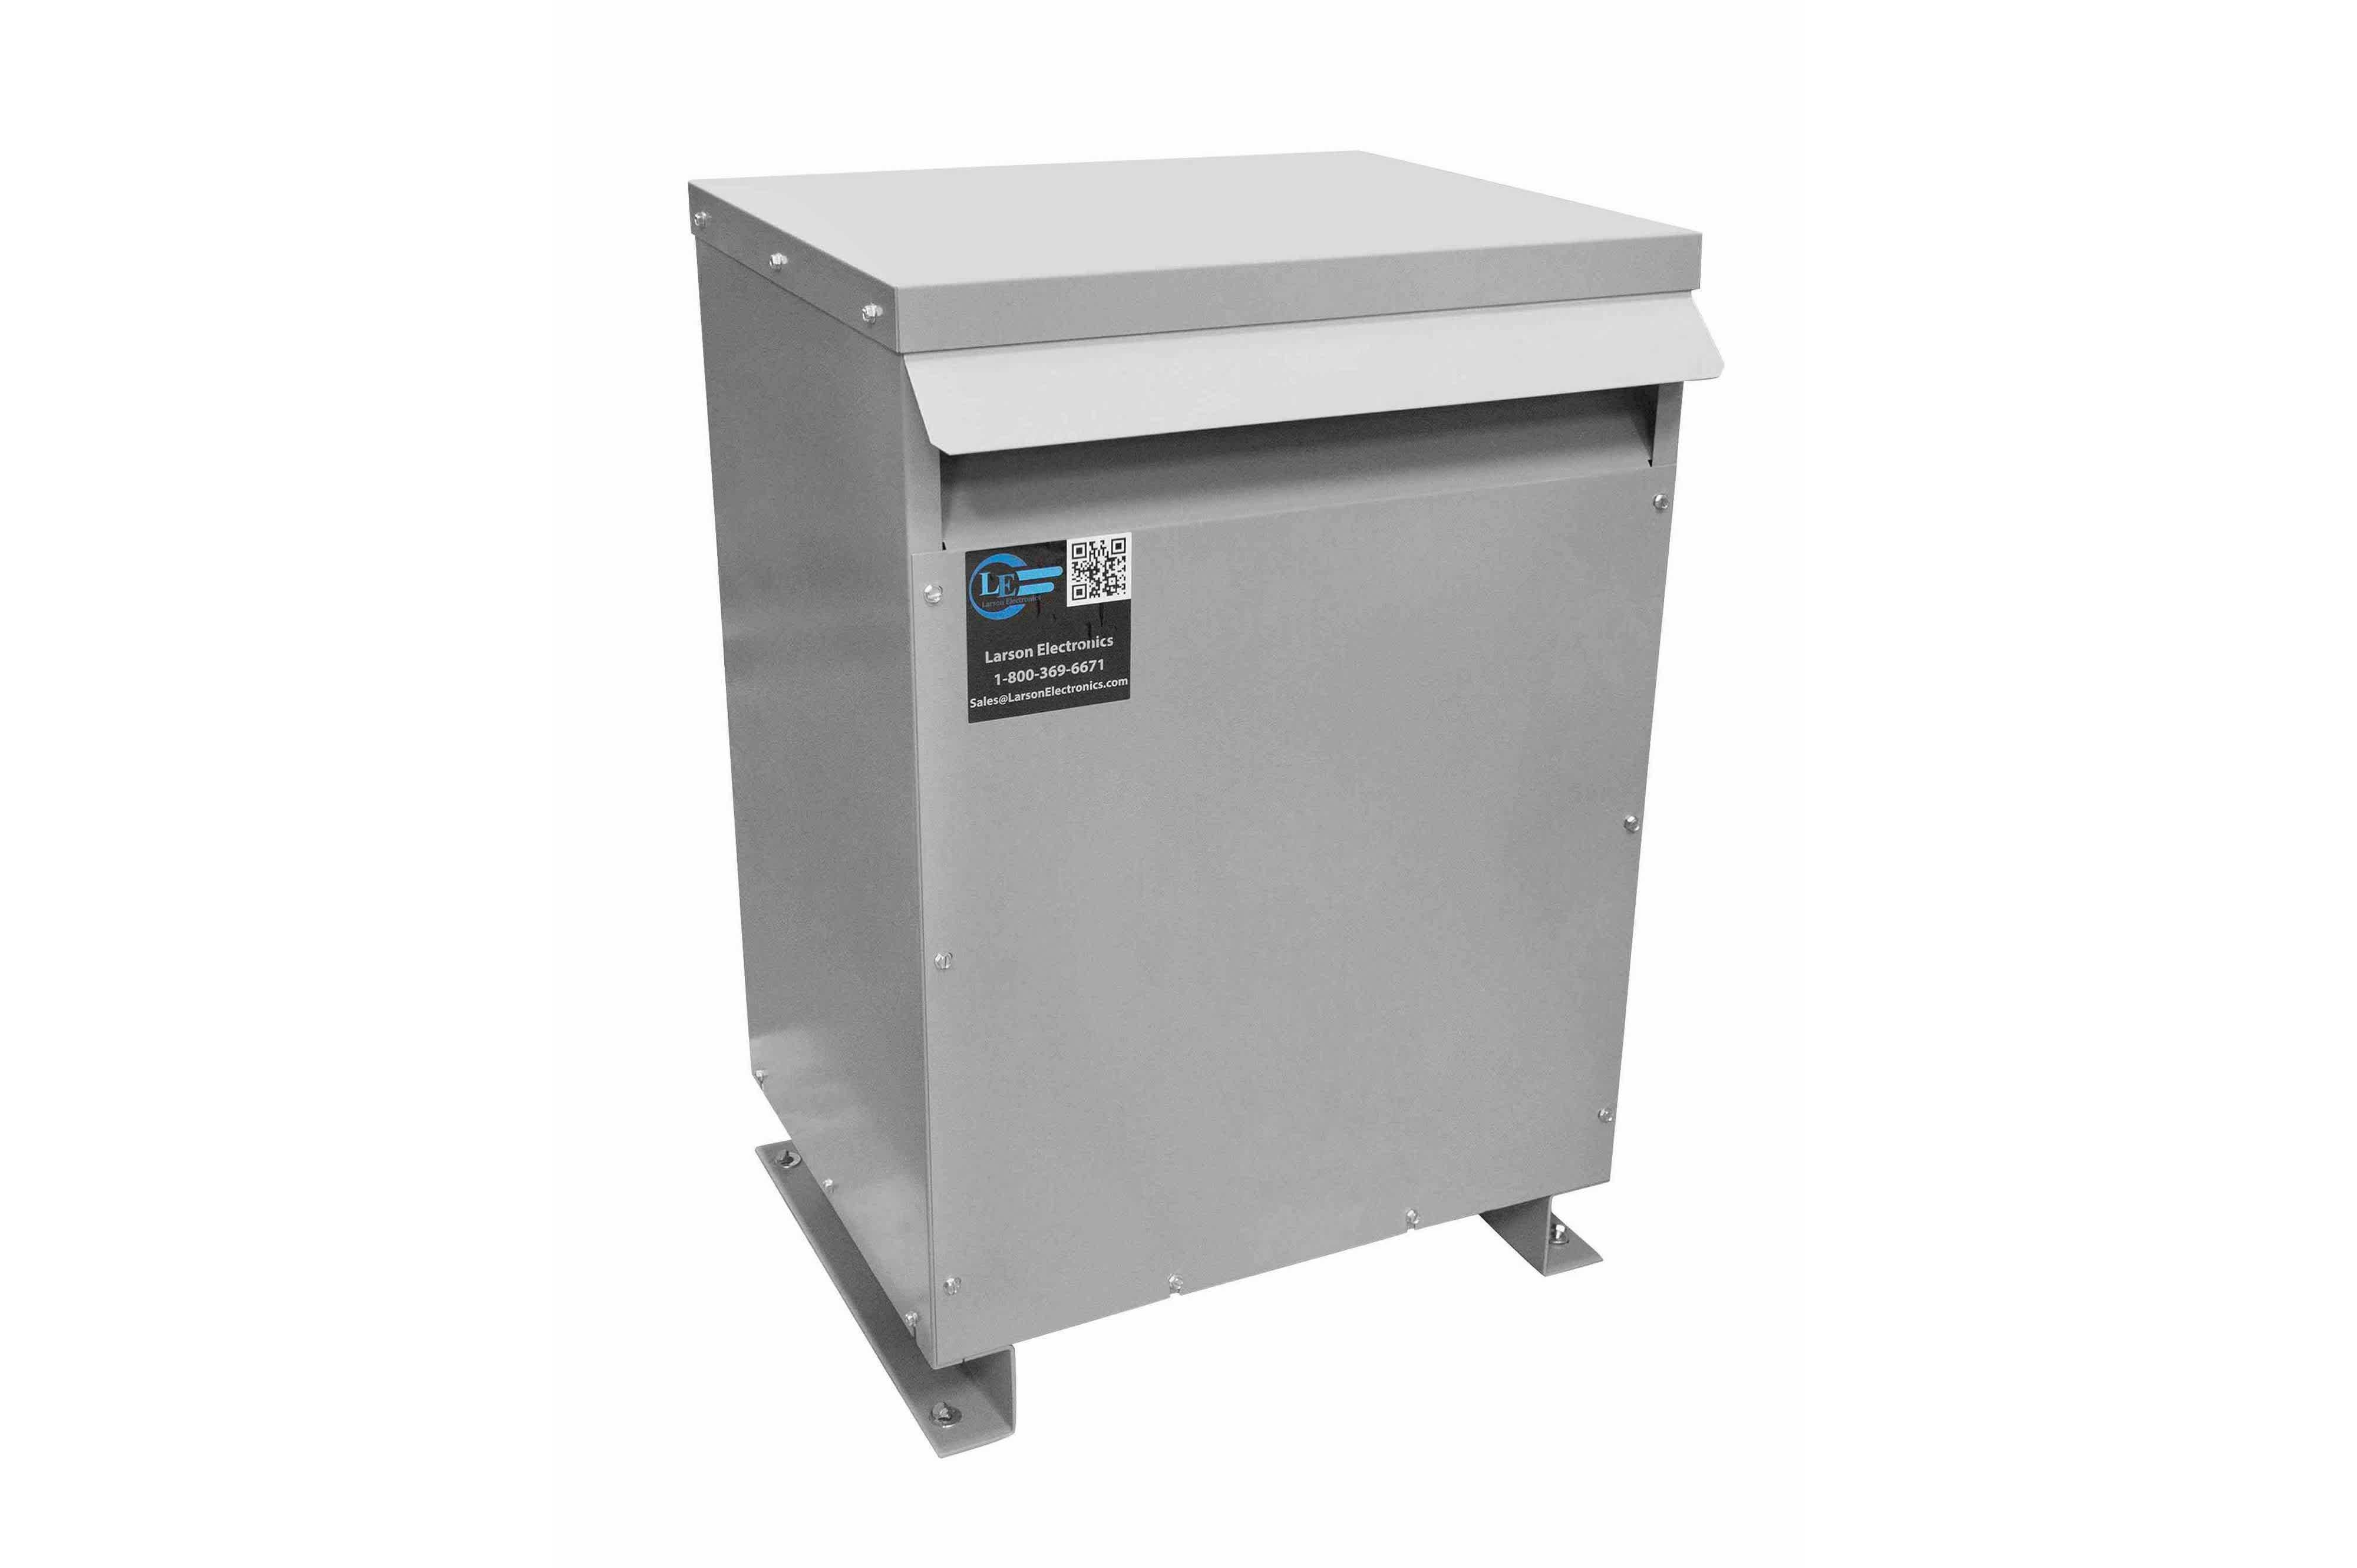 11 kVA 3PH Isolation Transformer, 480V Wye Primary, 400V Delta Secondary, N3R, Ventilated, 60 Hz